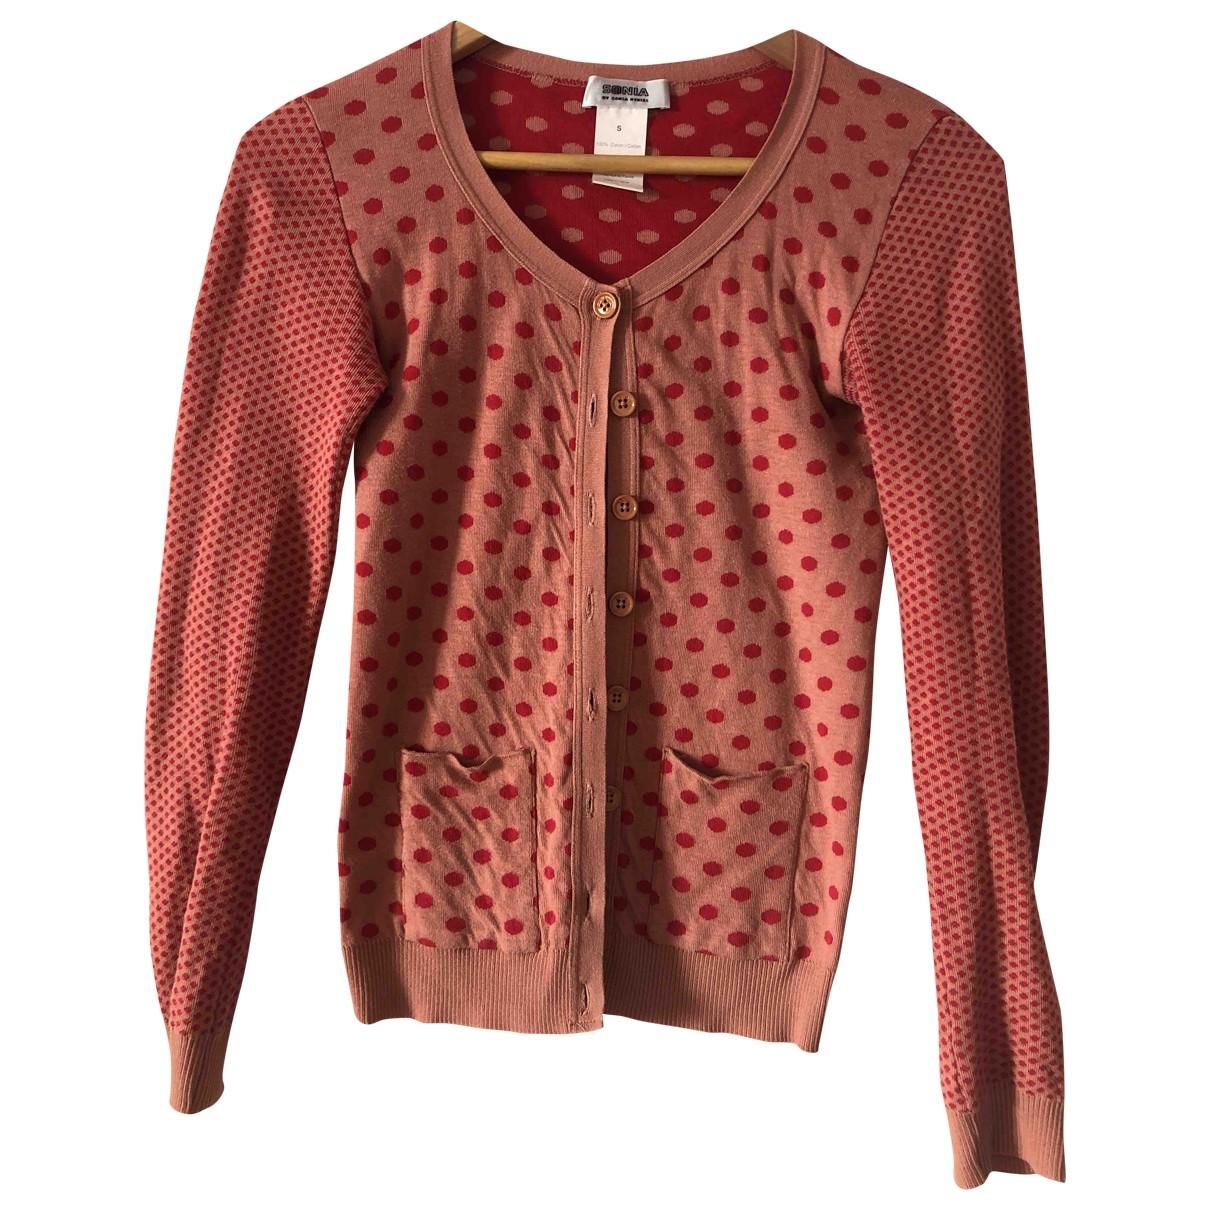 Sonia By Sonia Rykiel - Pull   pour femme en coton - rouge